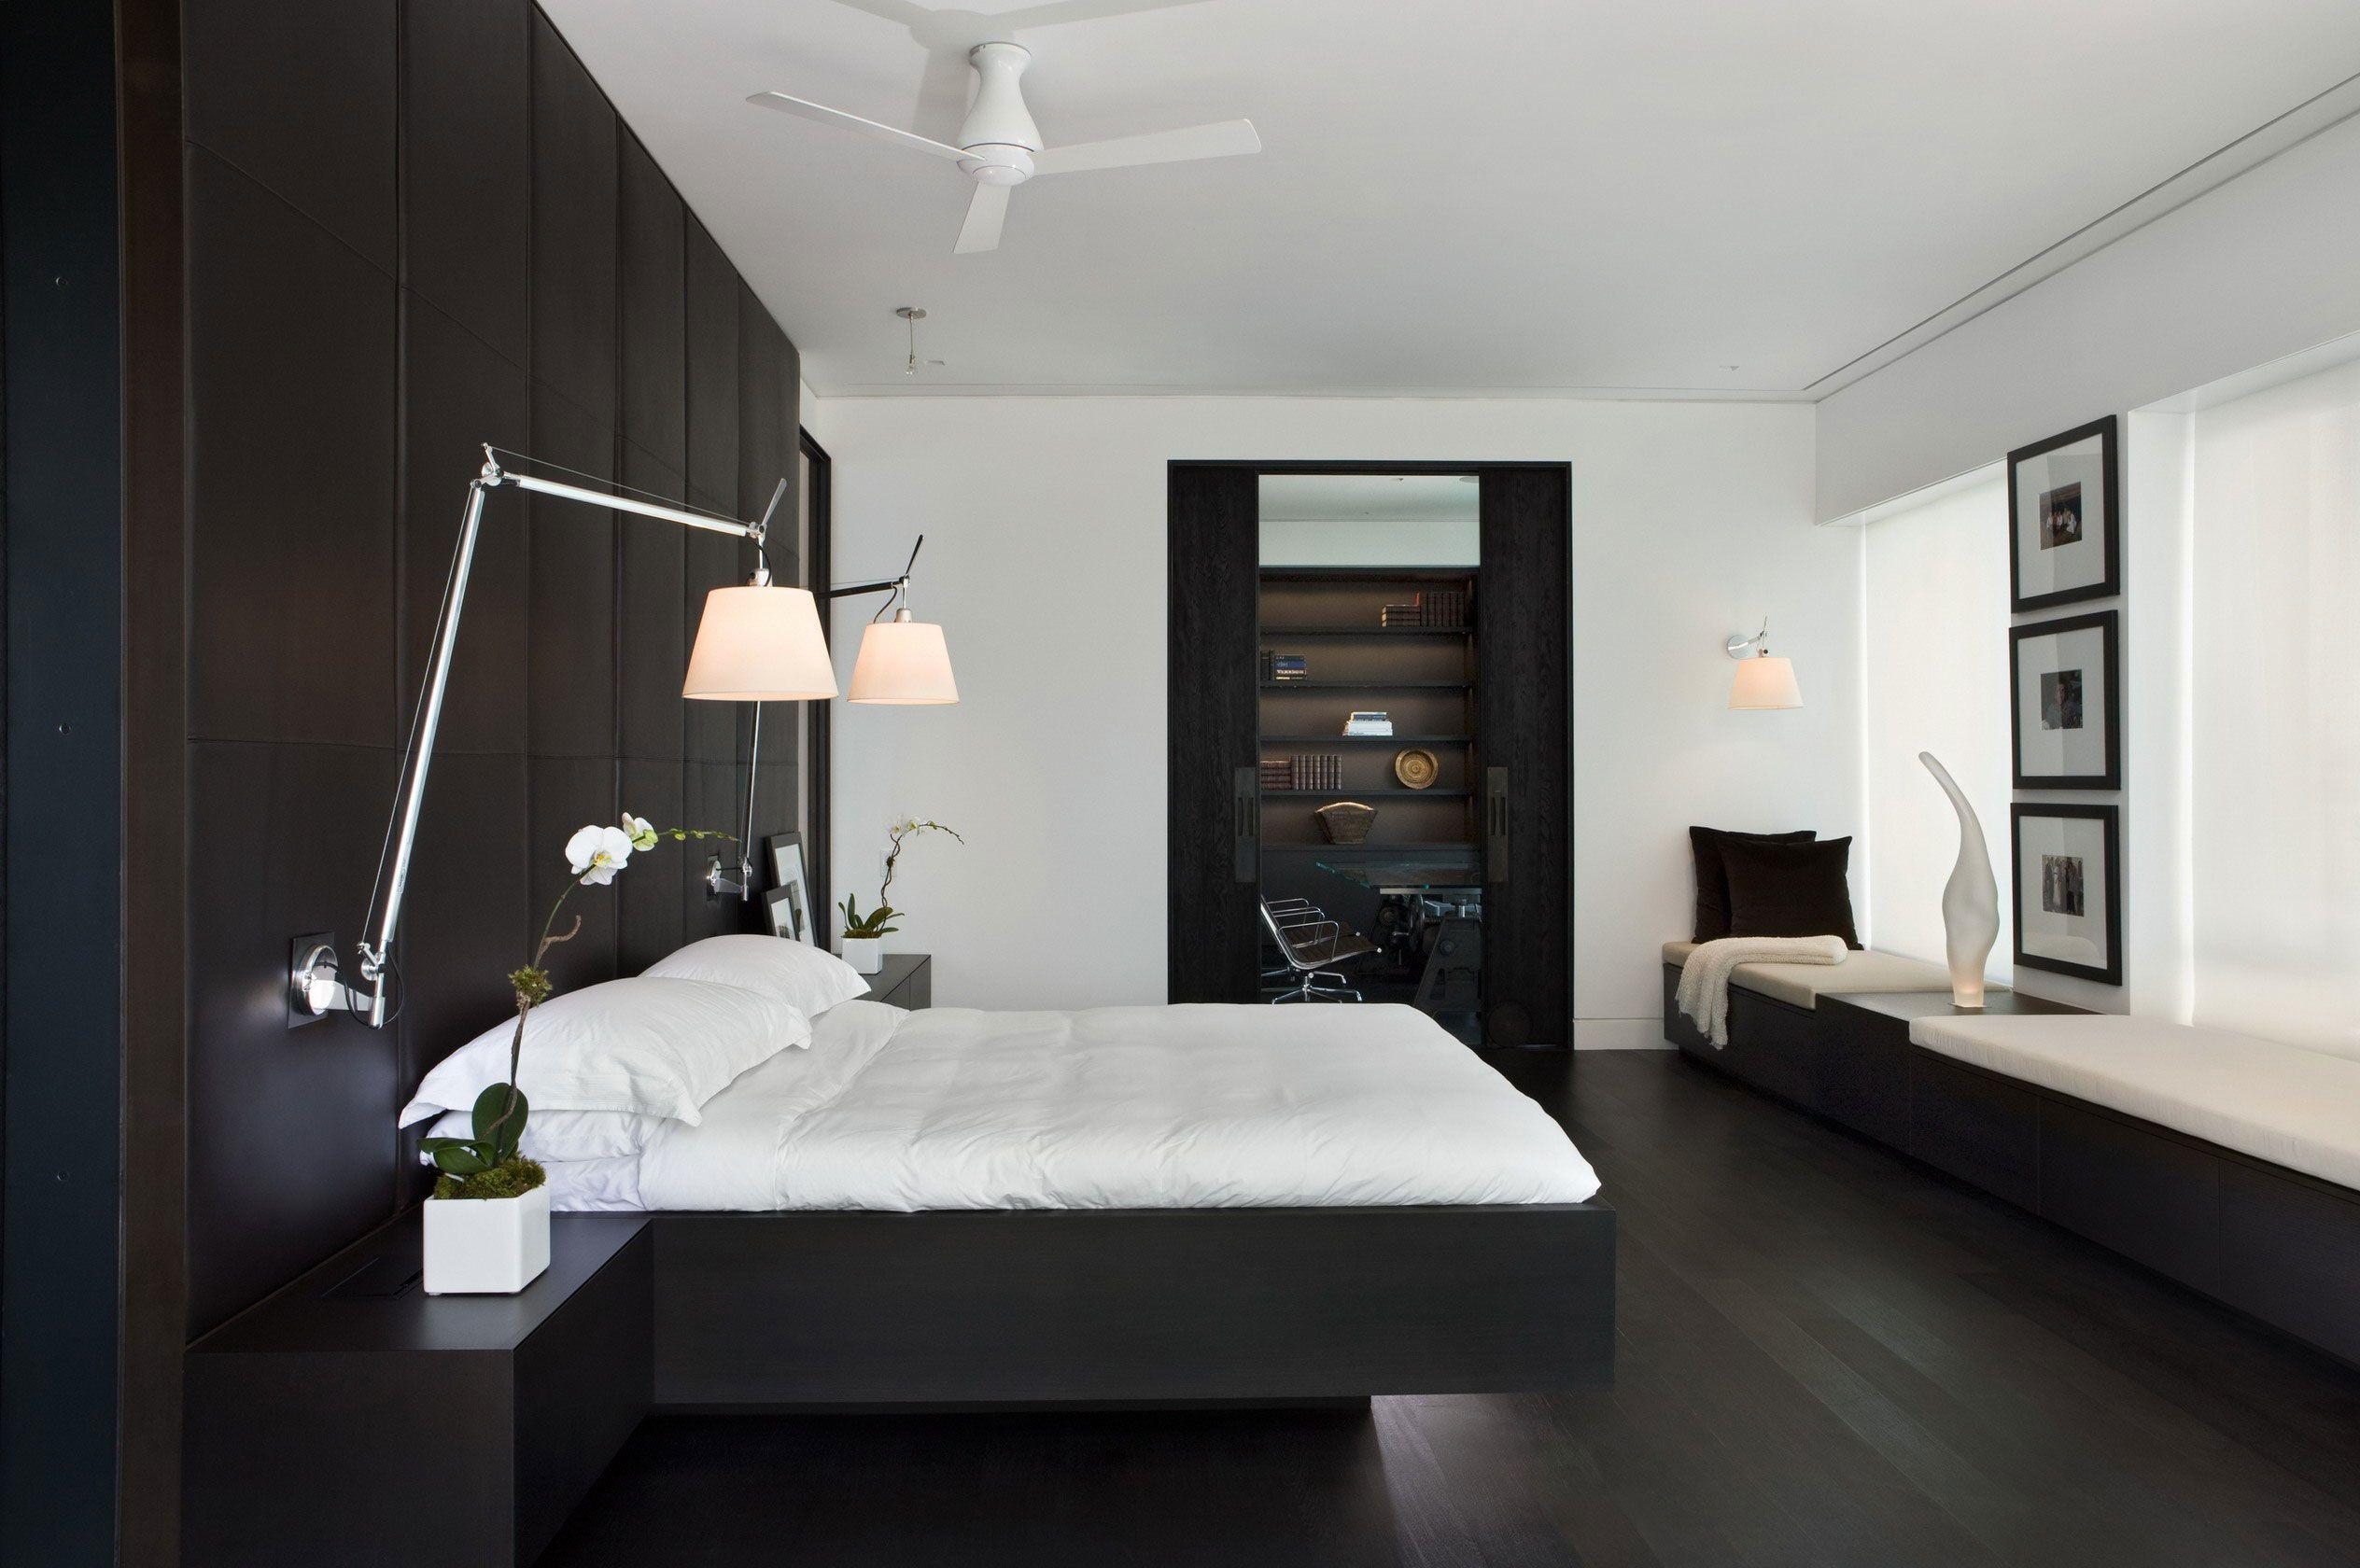 17 Lovely Decorating With Dark Hardwood Floors Unique Flooring Ideas